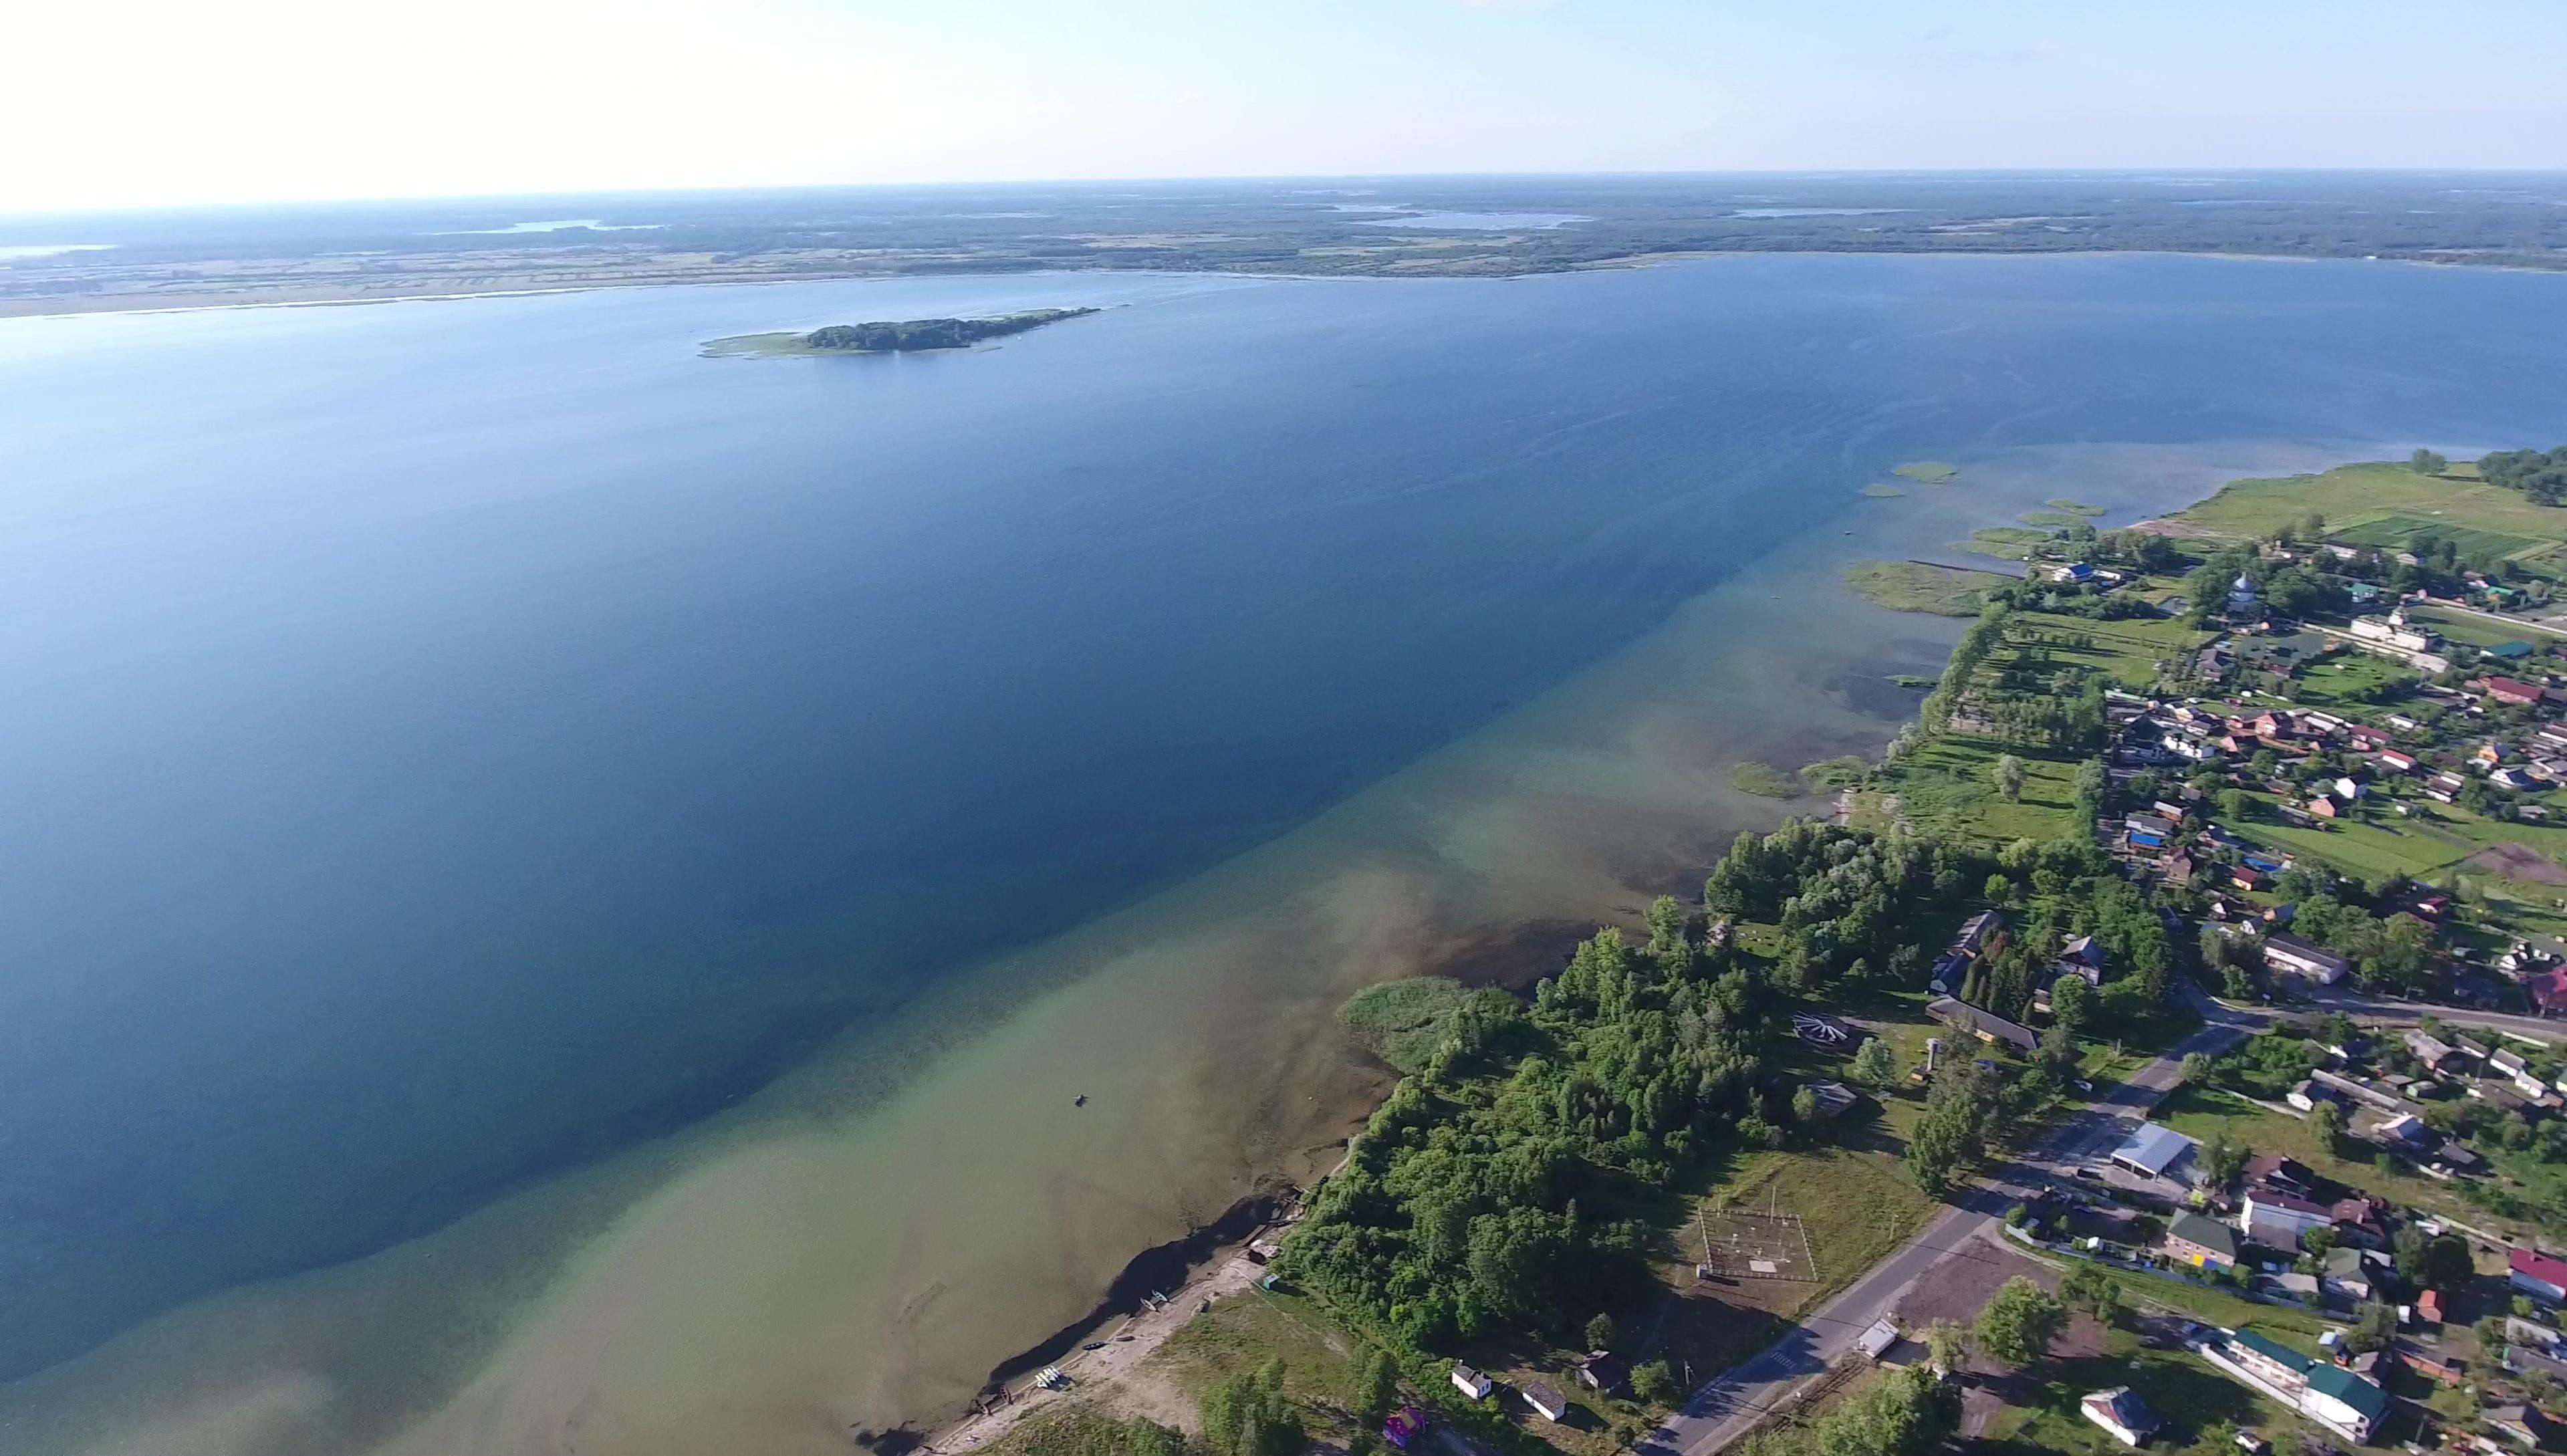 Картинки по запросу Озеро світязб